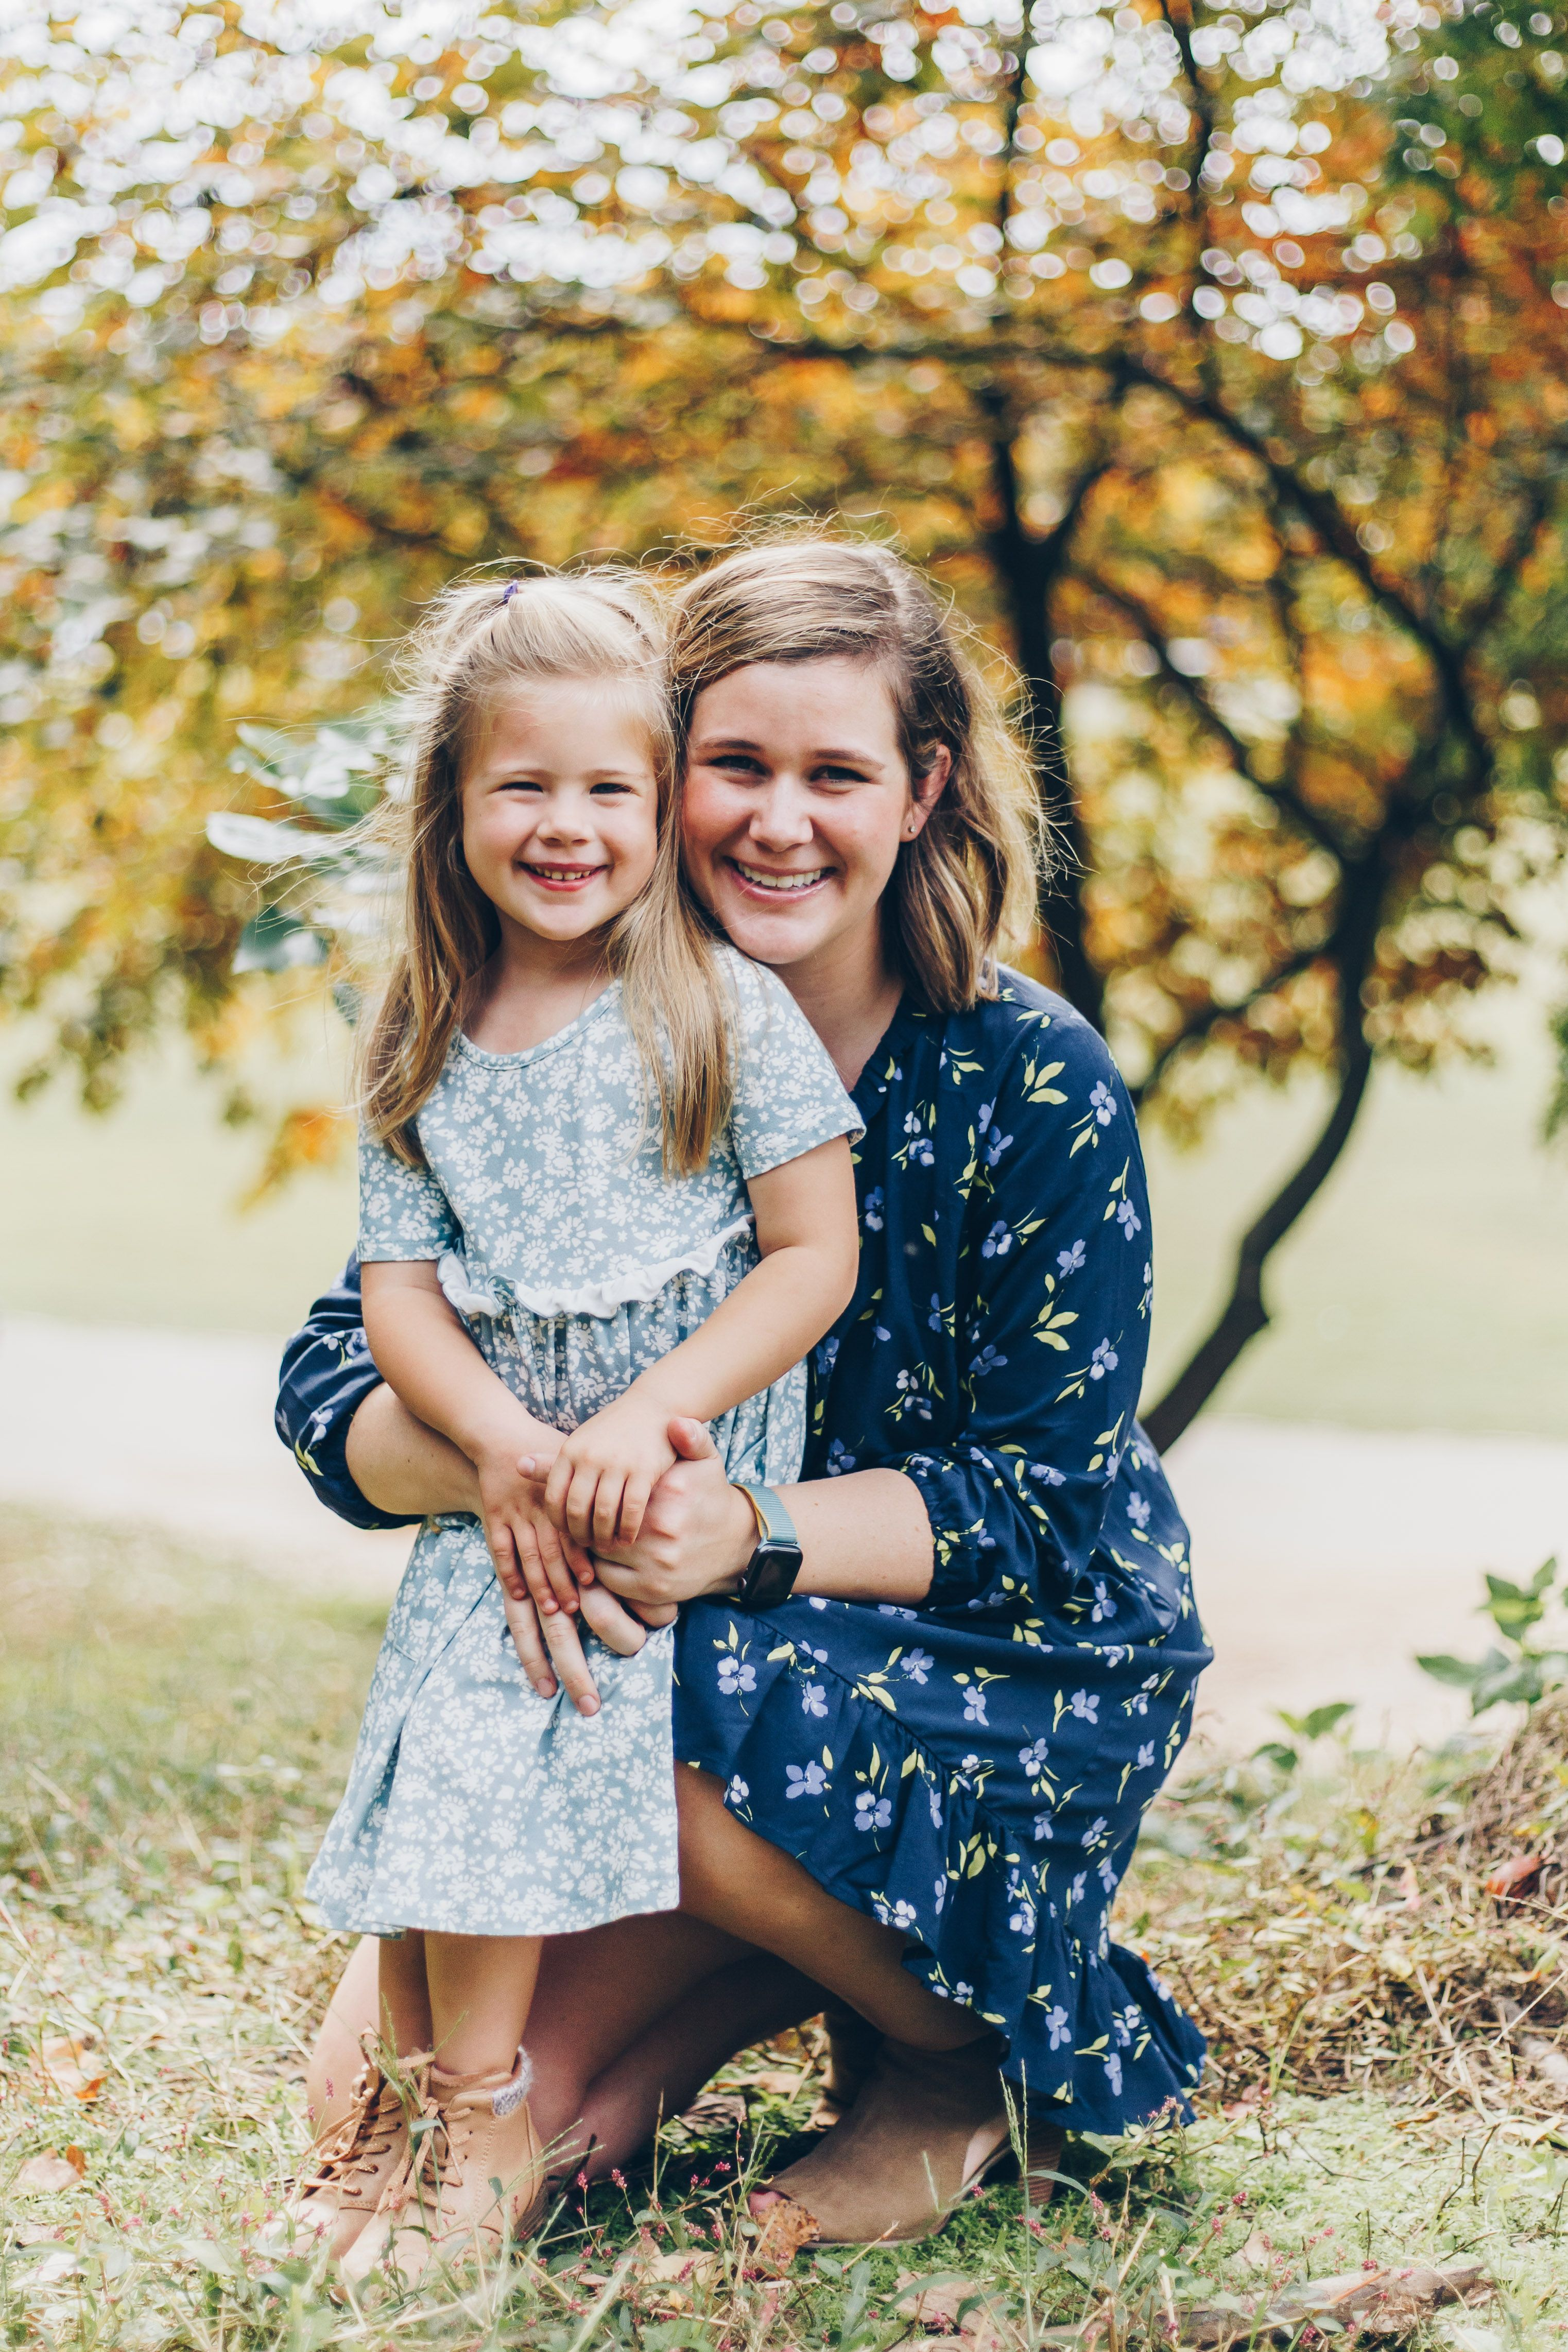 Katelyn Leblanc Photography In 2020 Professional Portrait Family Photo Sessions Photo Sessions